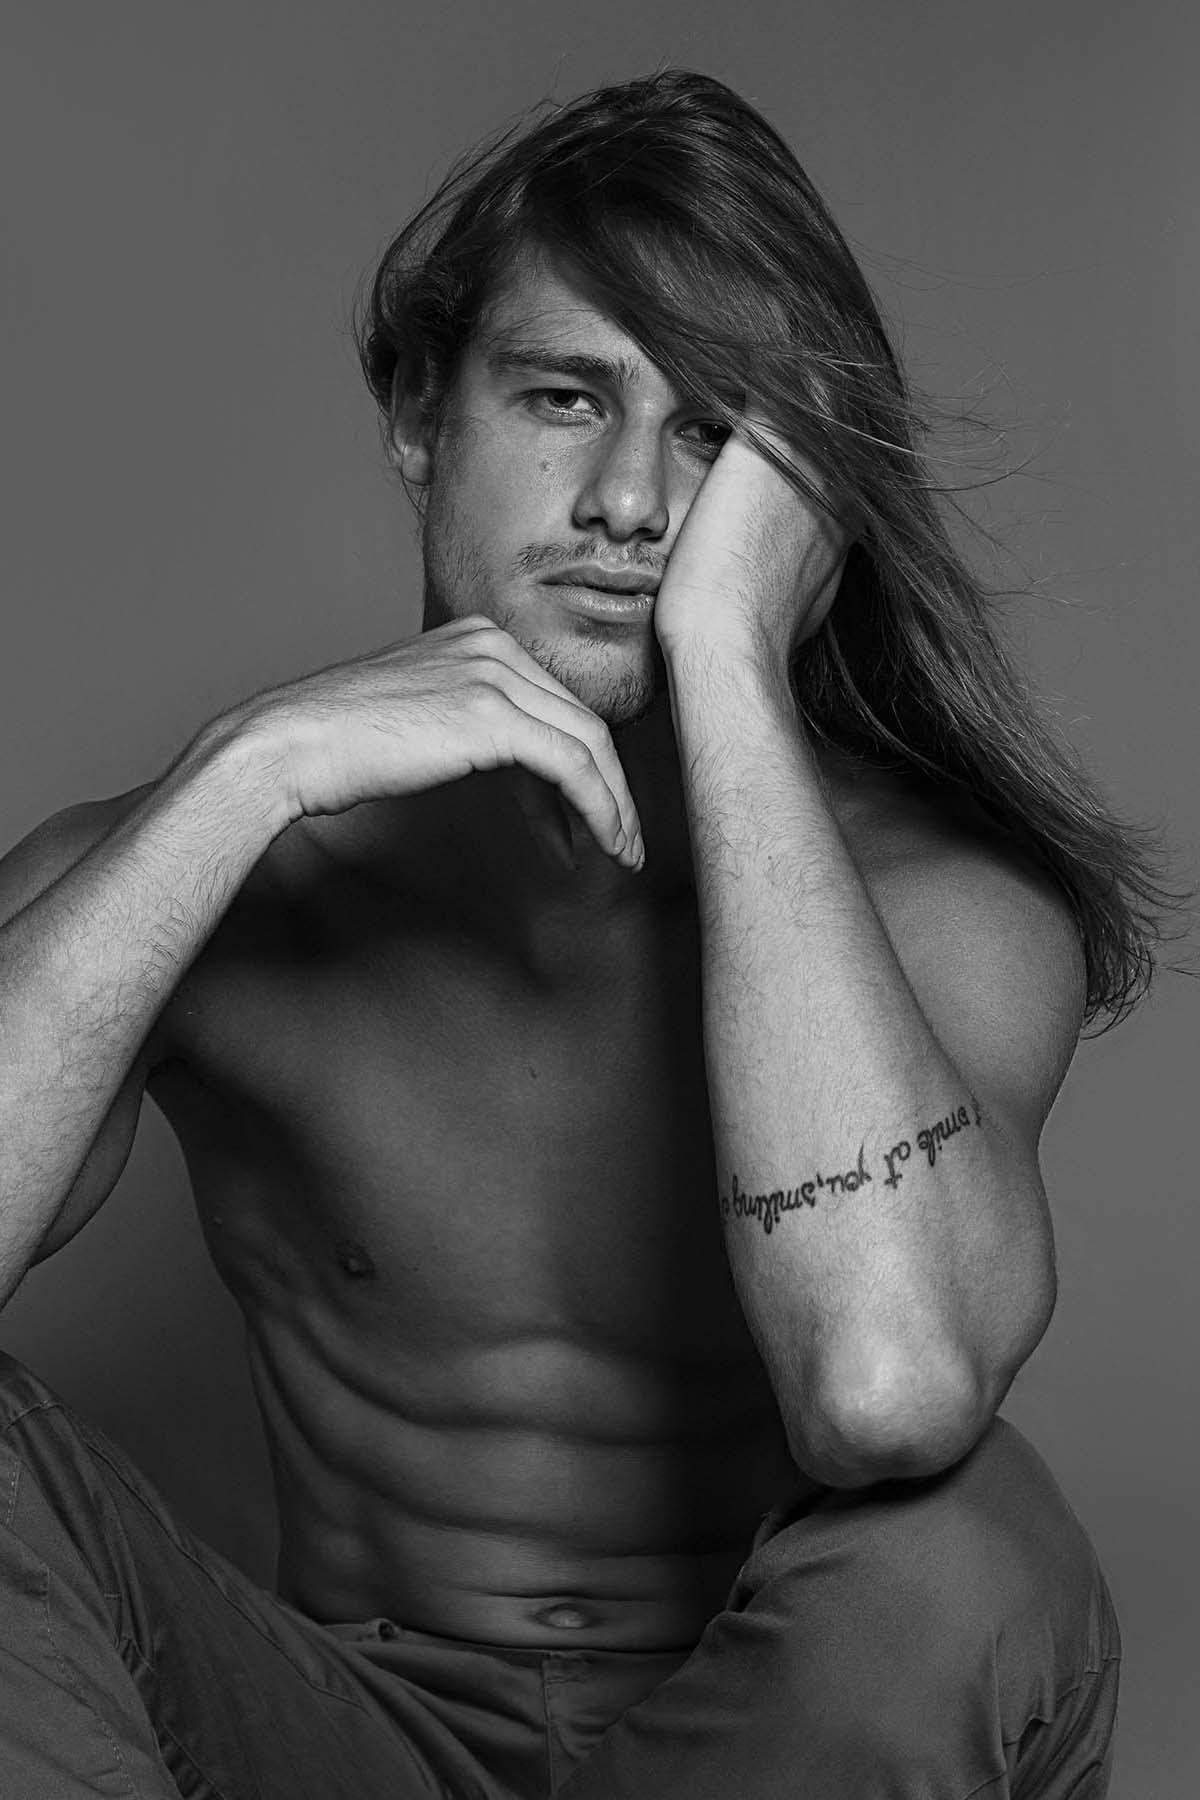 Matheus Martins by Anthenor Neto for Brazilian Male Model